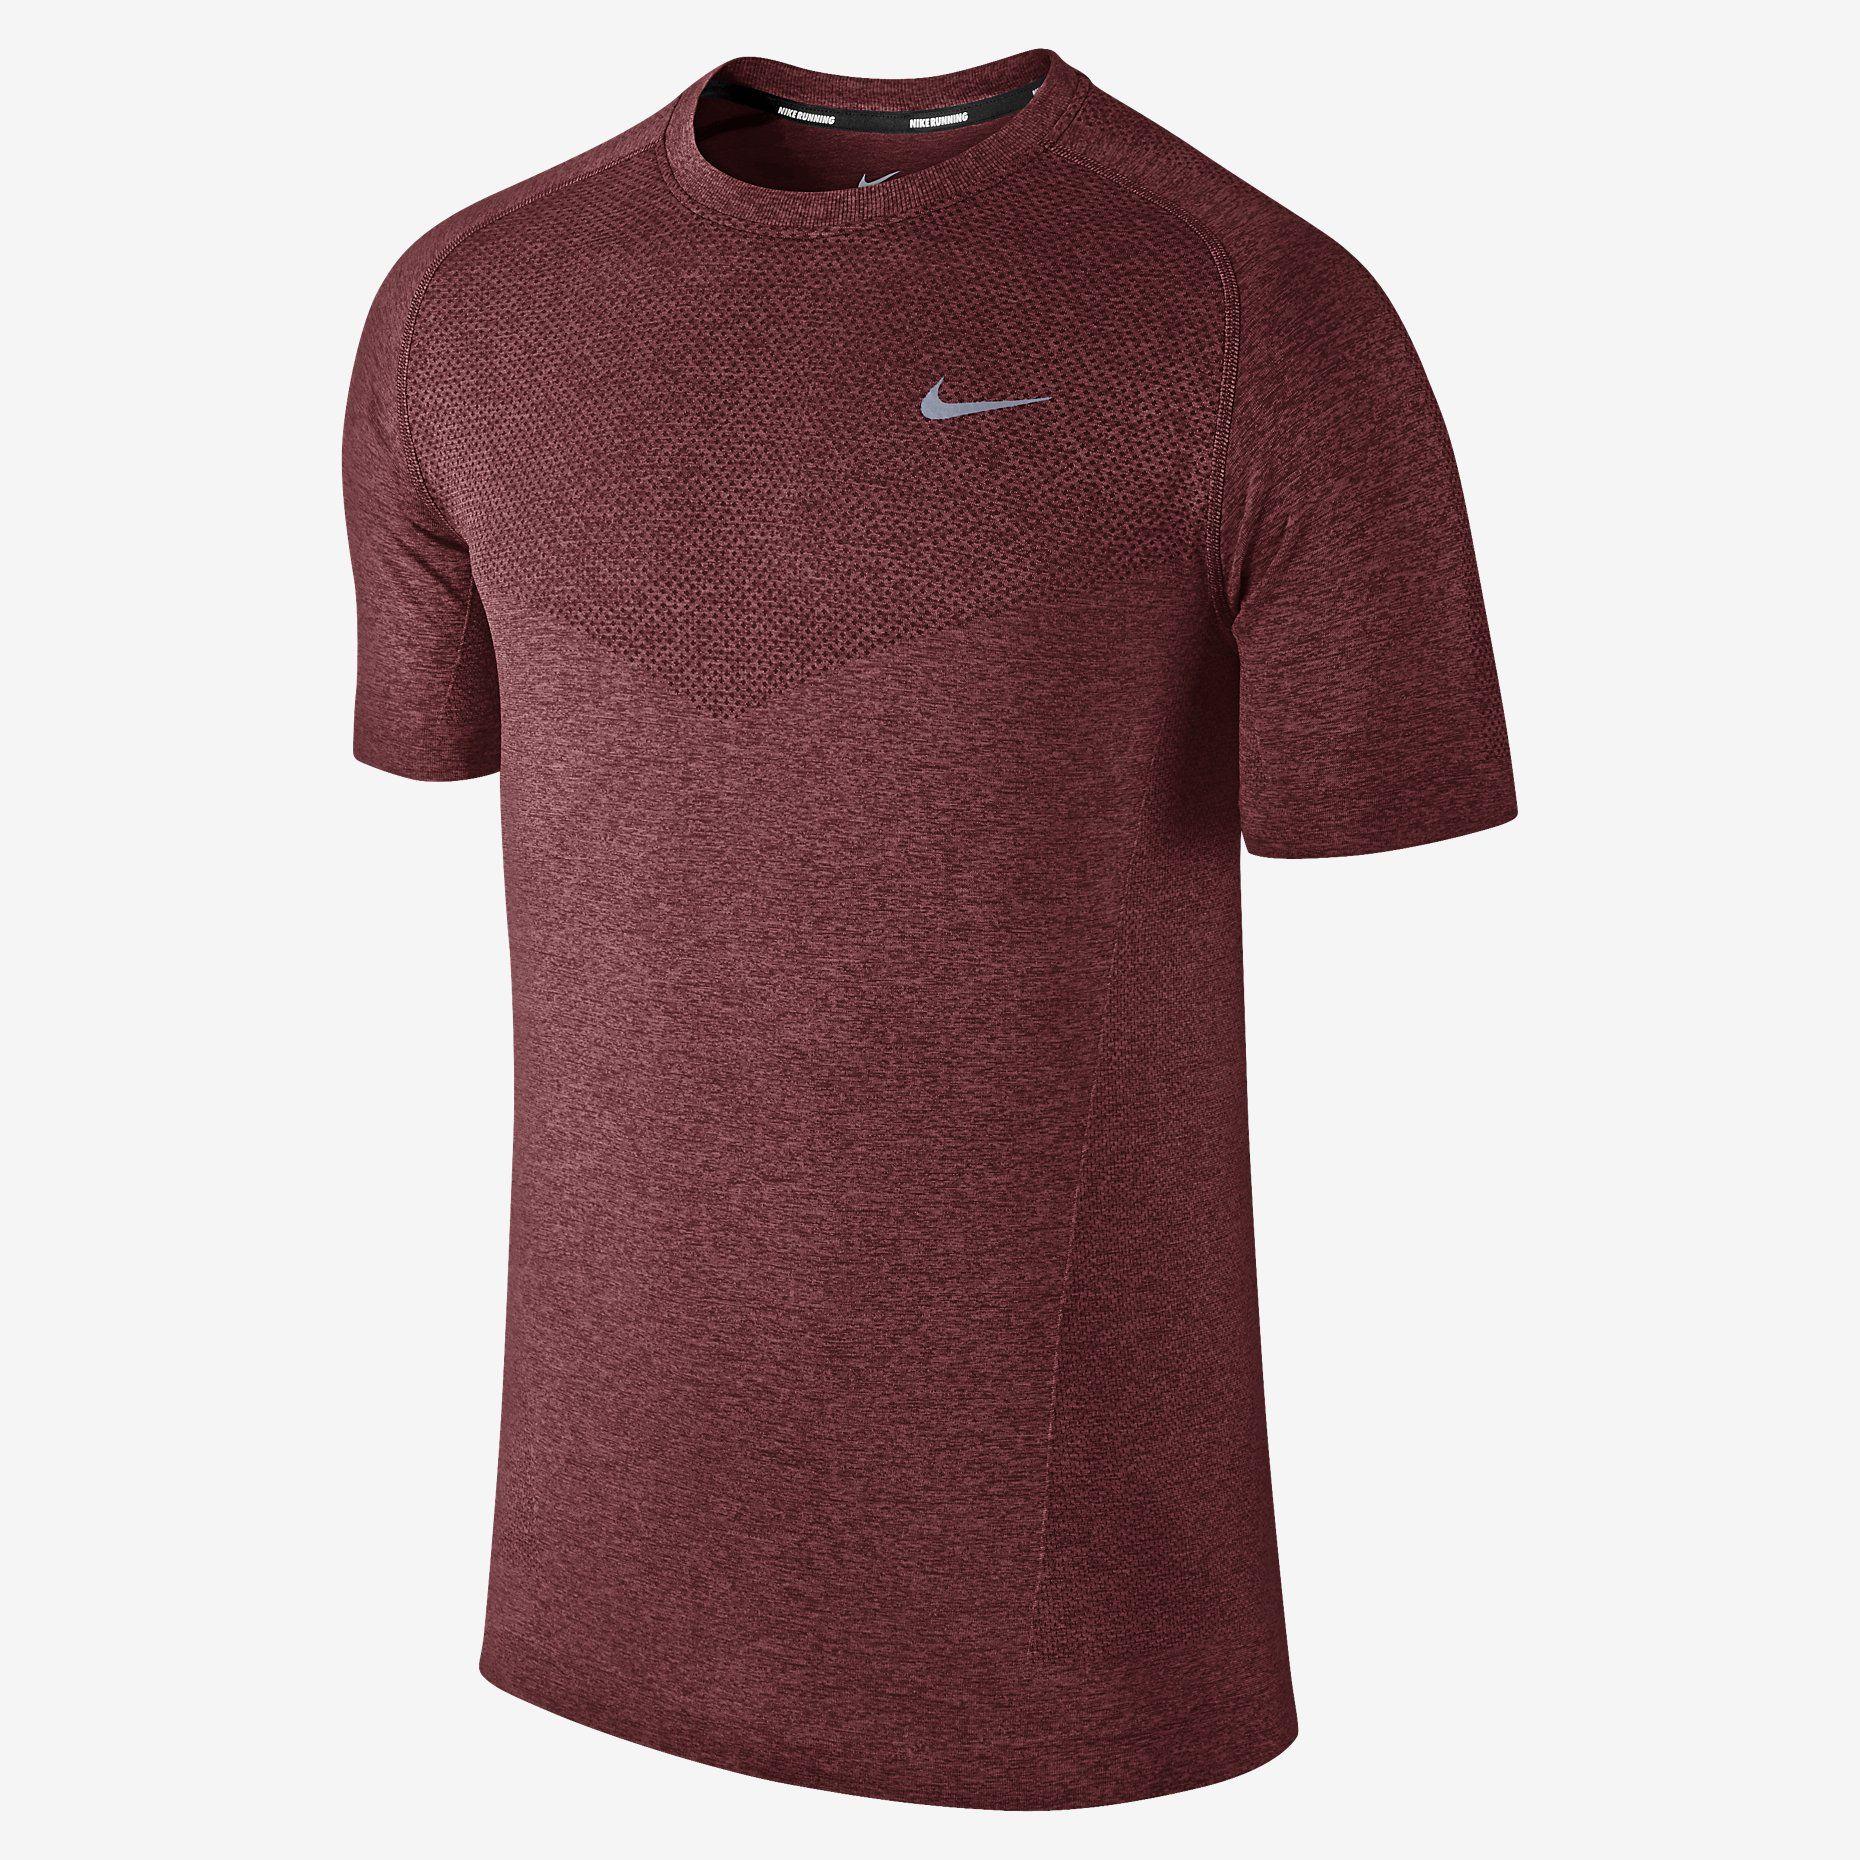 d3ee99f33 Nike Dri-FIT Knit Short-Sleeve Men's Running Shirt. Nike Store UK ...